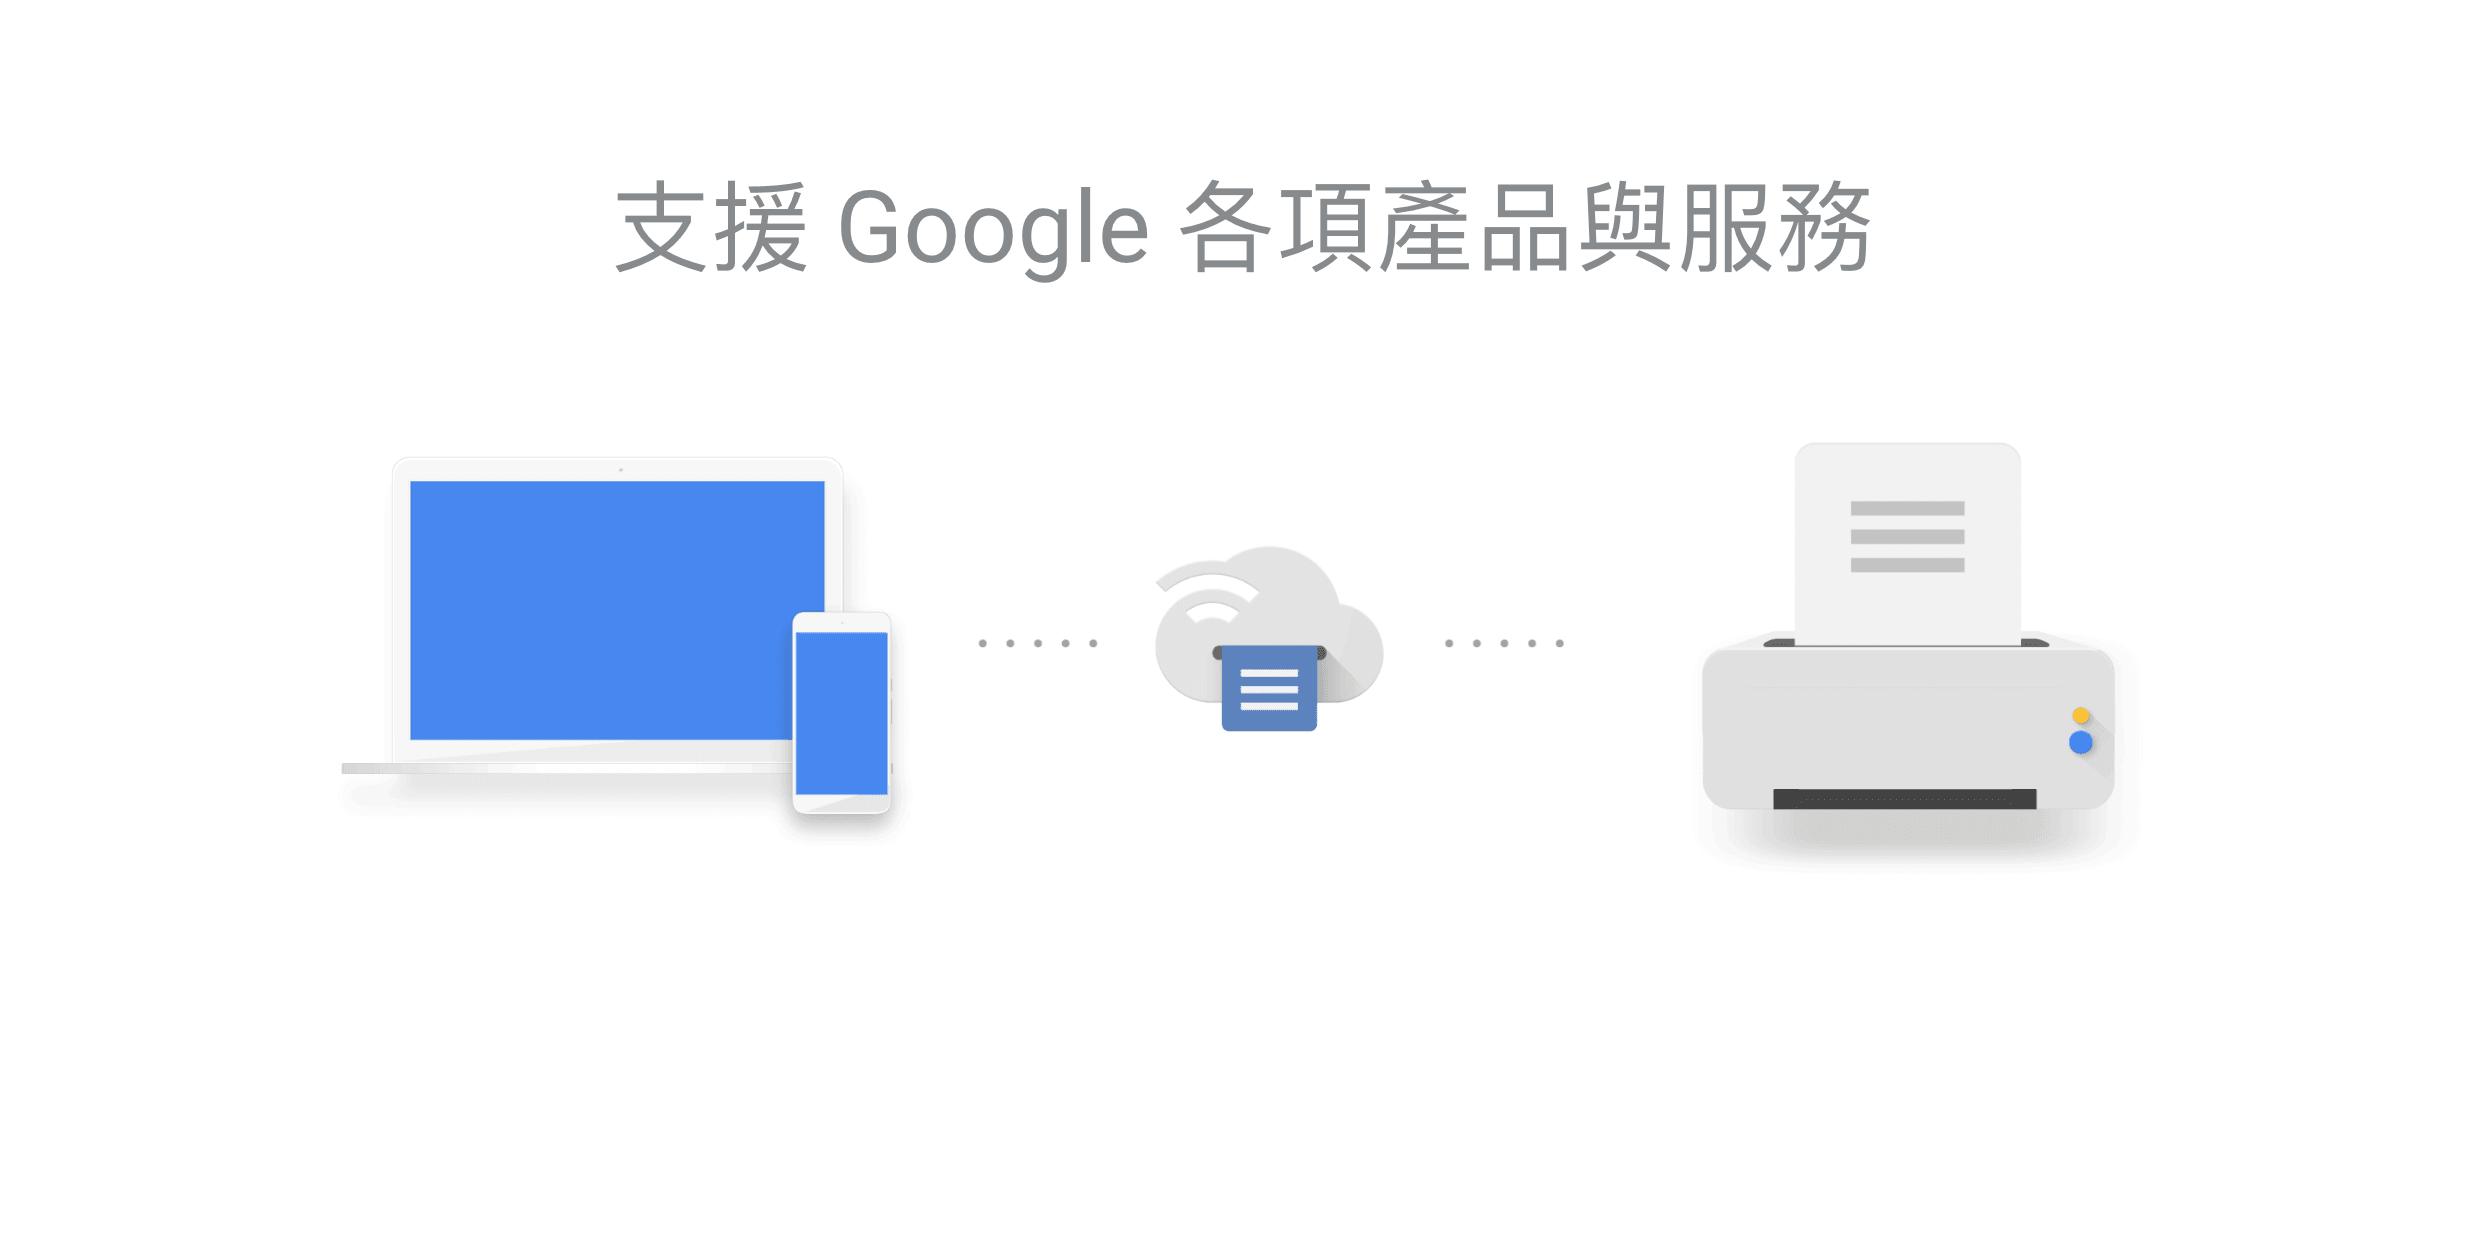 Google Cloud Print Offical Page Google 雲端列印 GCP 支持哪些網路雲端連線印表機產品、型號?